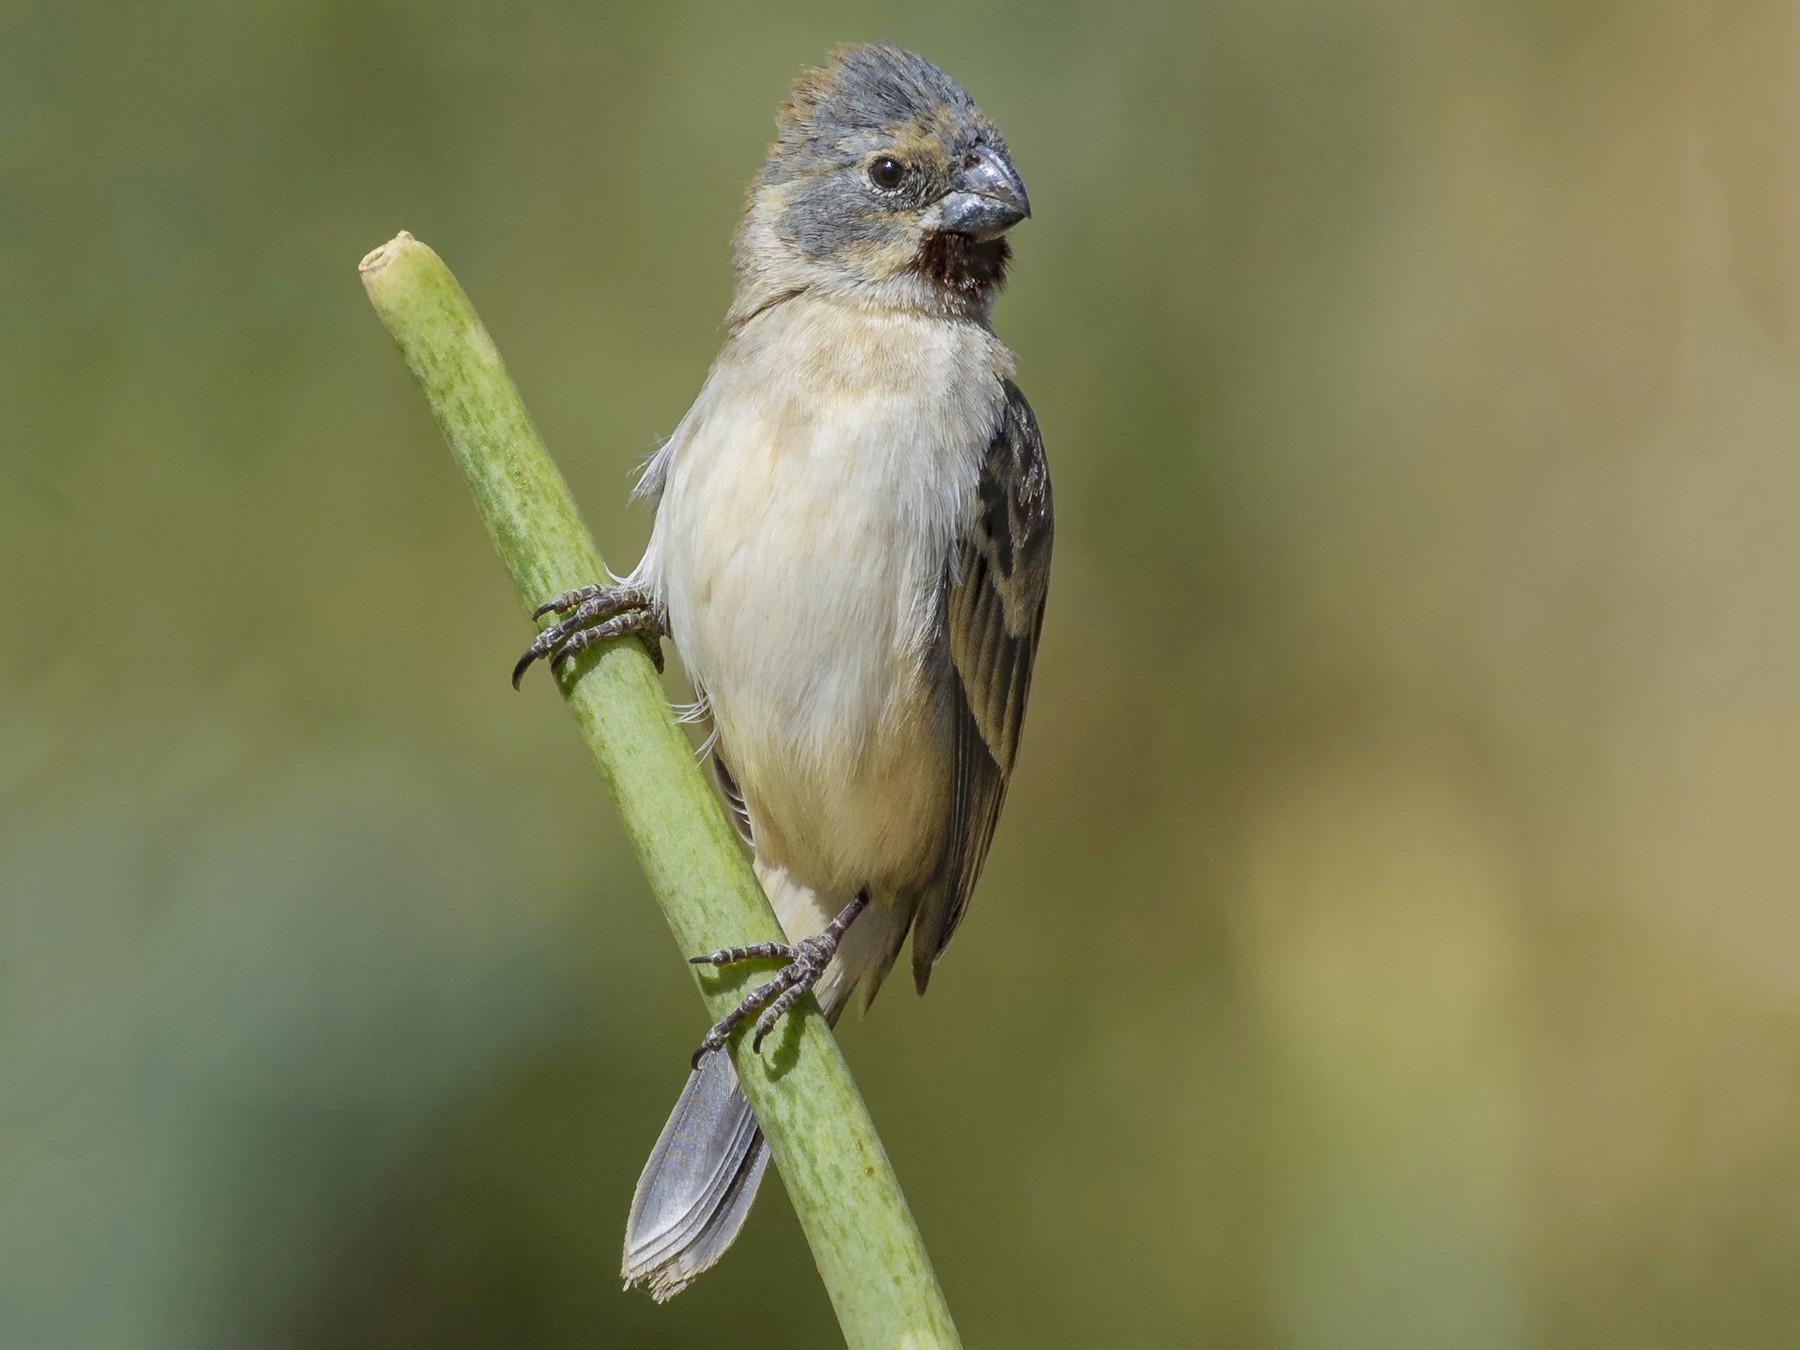 Chestnut-throated Seedeater - VERONICA ARAYA GARCIA